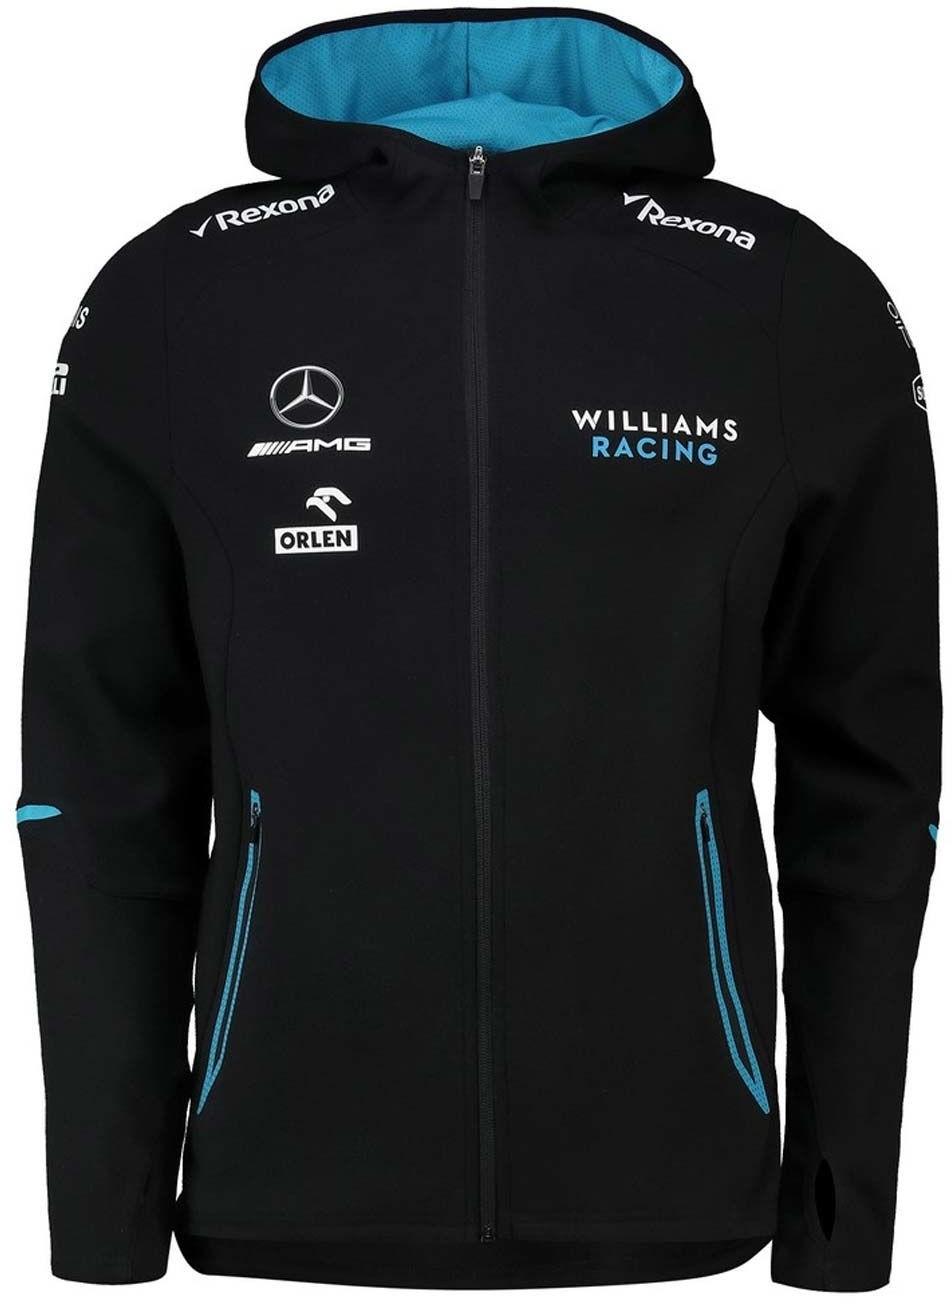 Williams Martini Racing F1 Bluza dziecięca z kapturem Hoodie czarna Team Williams Racing 2019 248766S